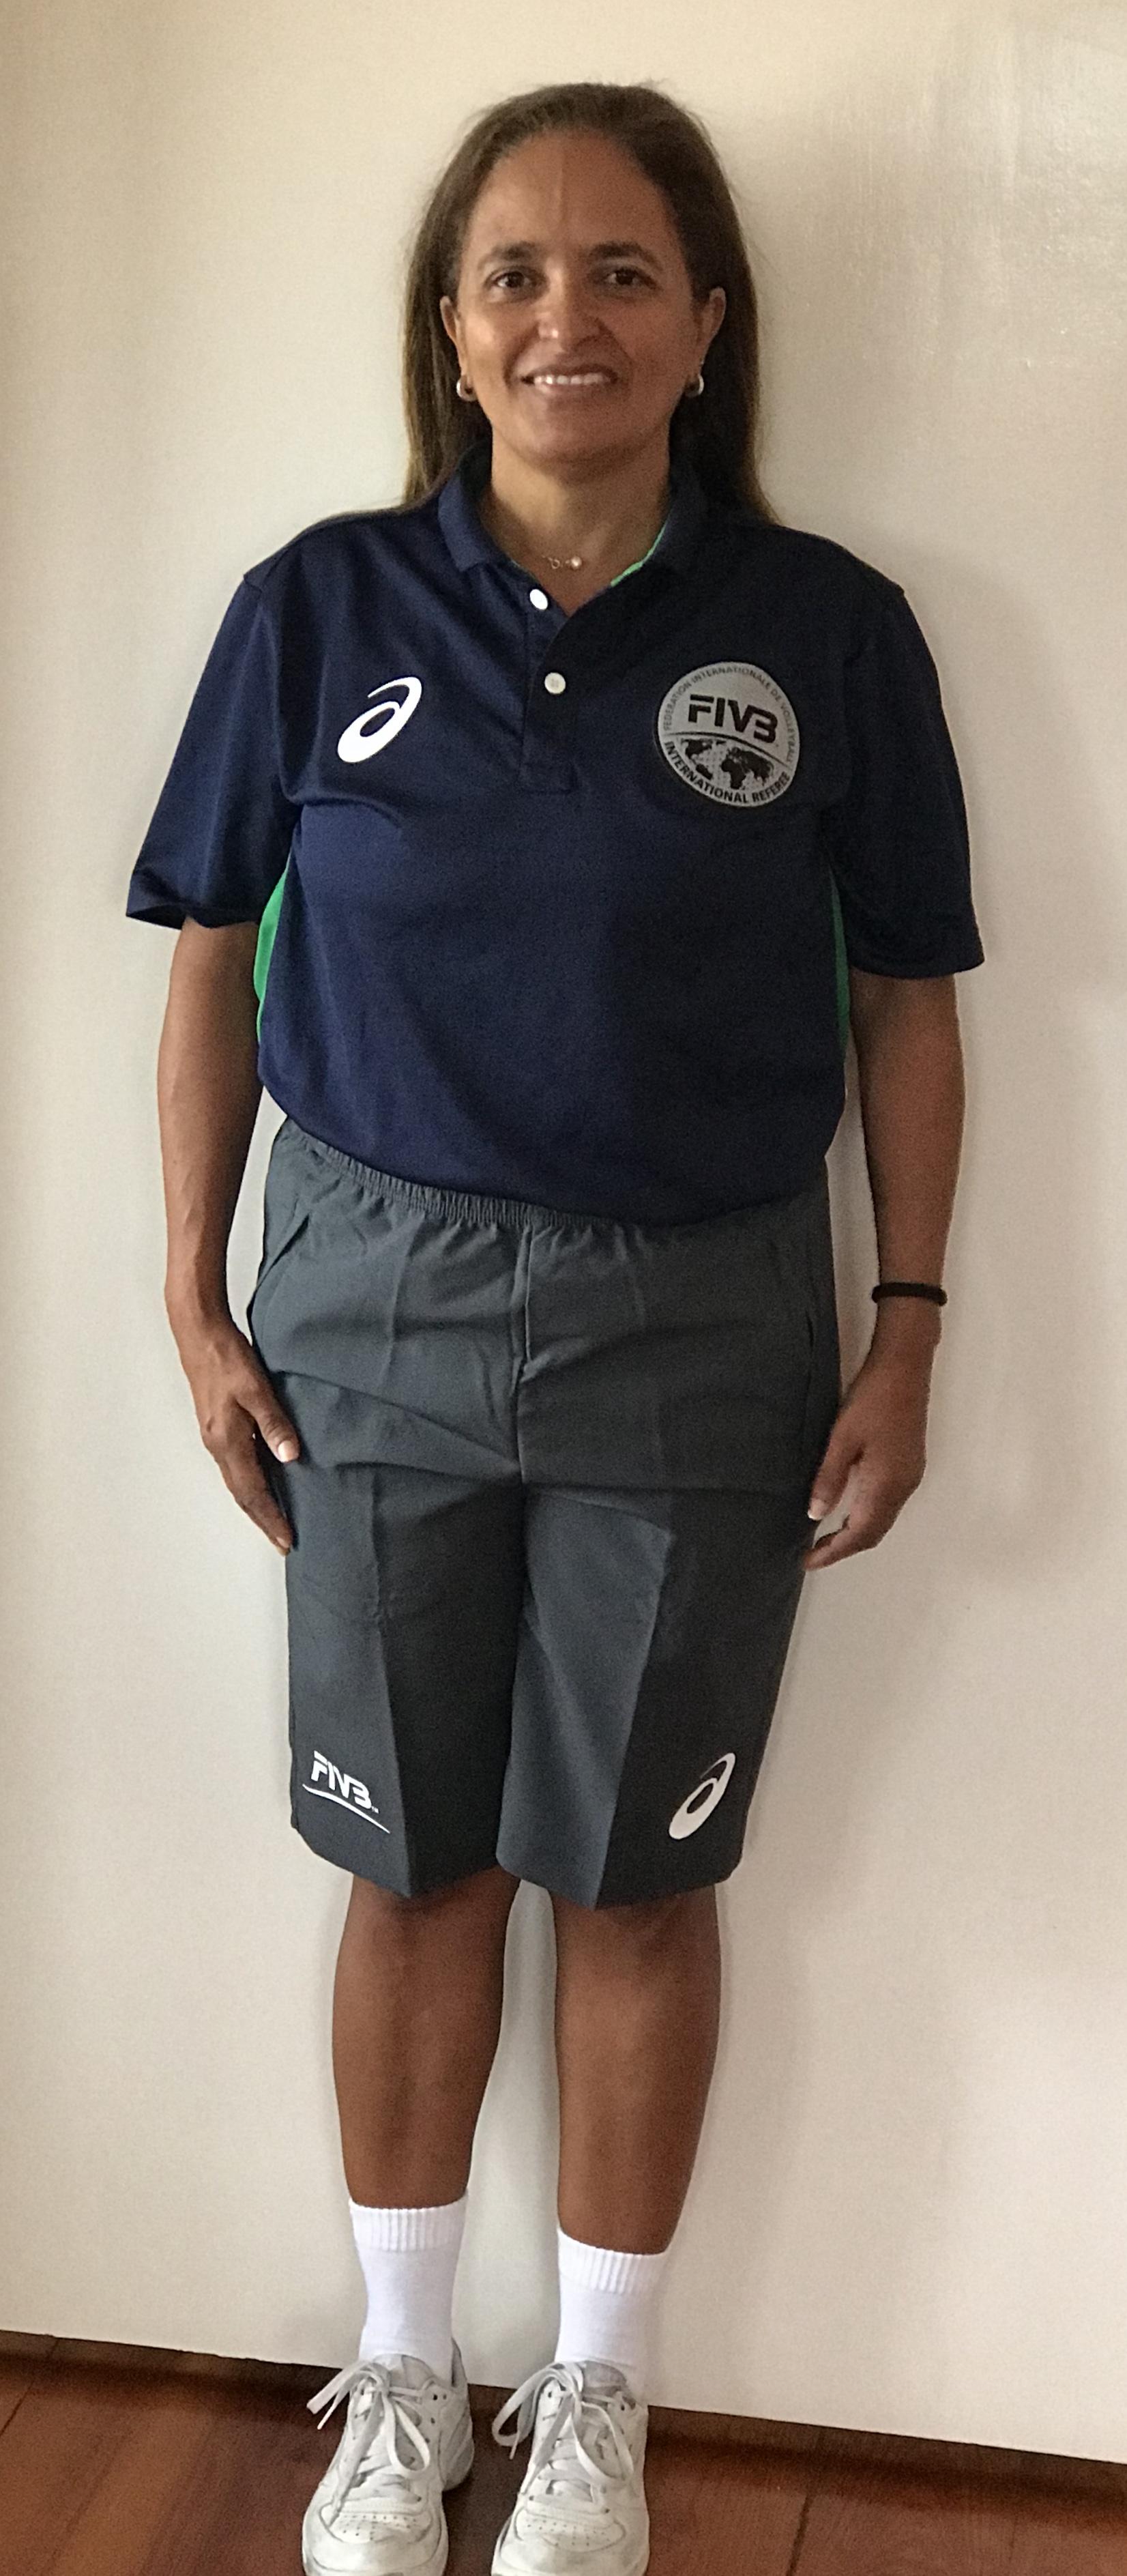 referee image